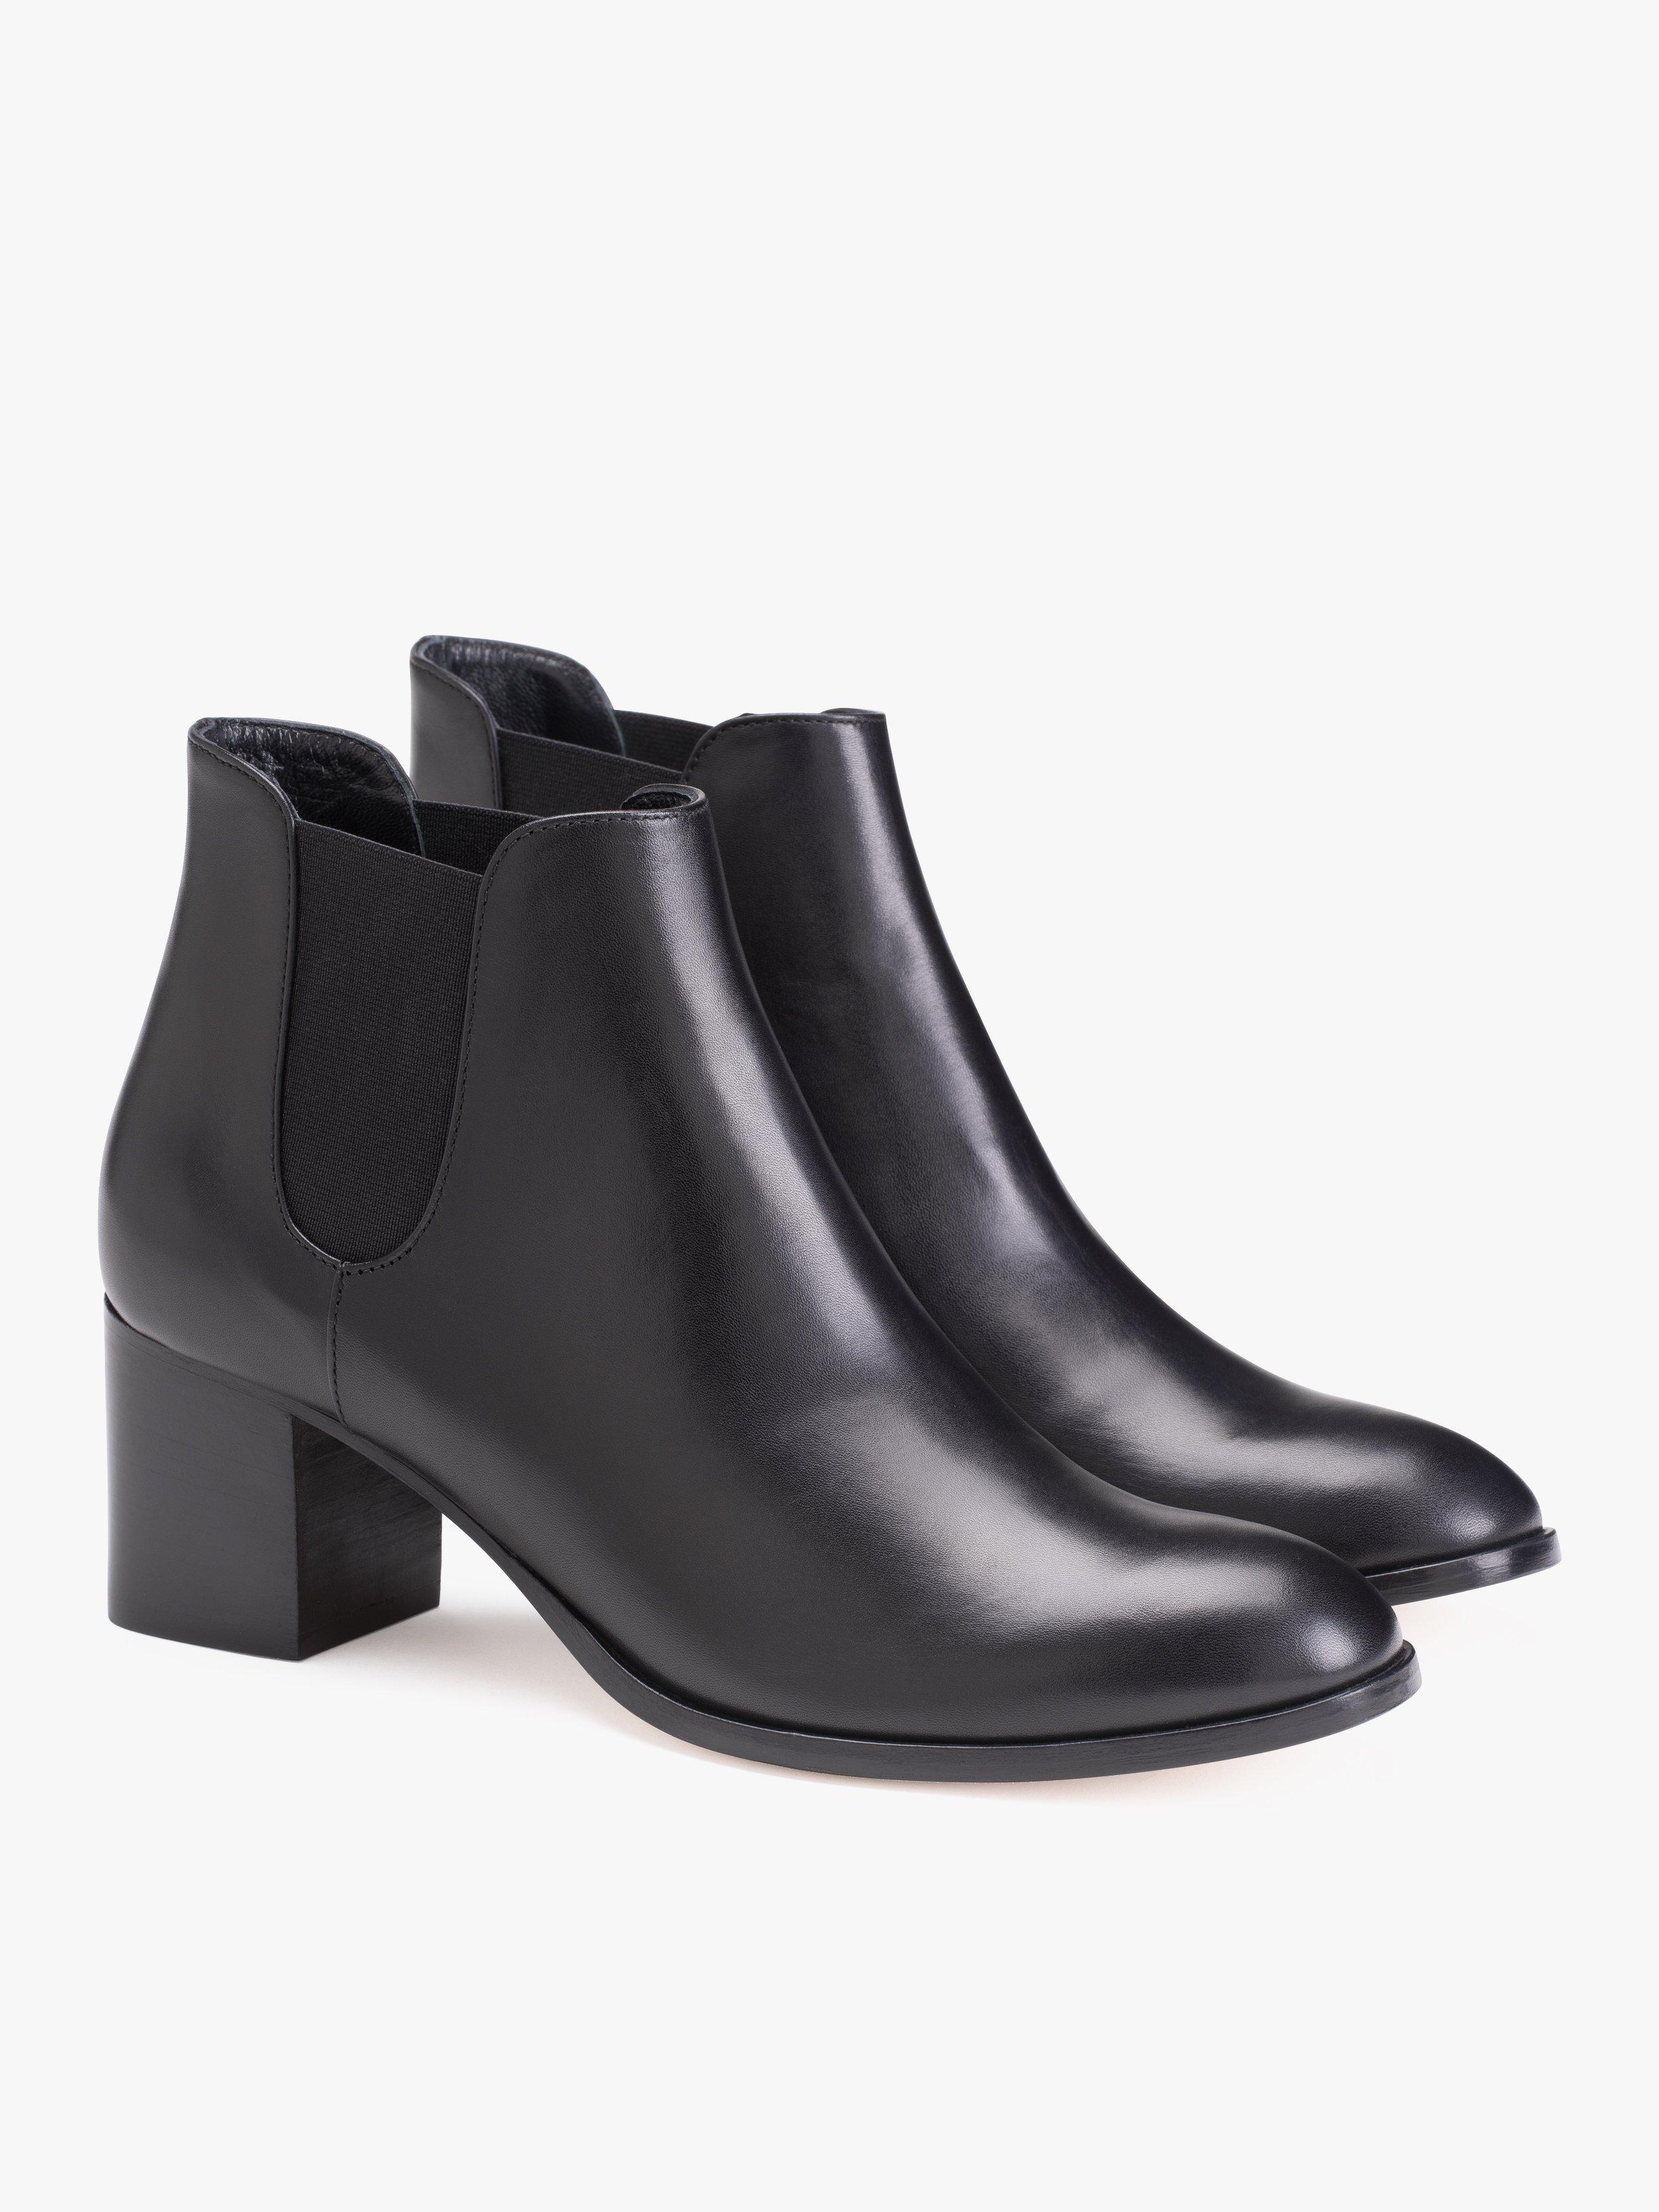 bottines cuir bottines en noires déborah 3RL5A4j